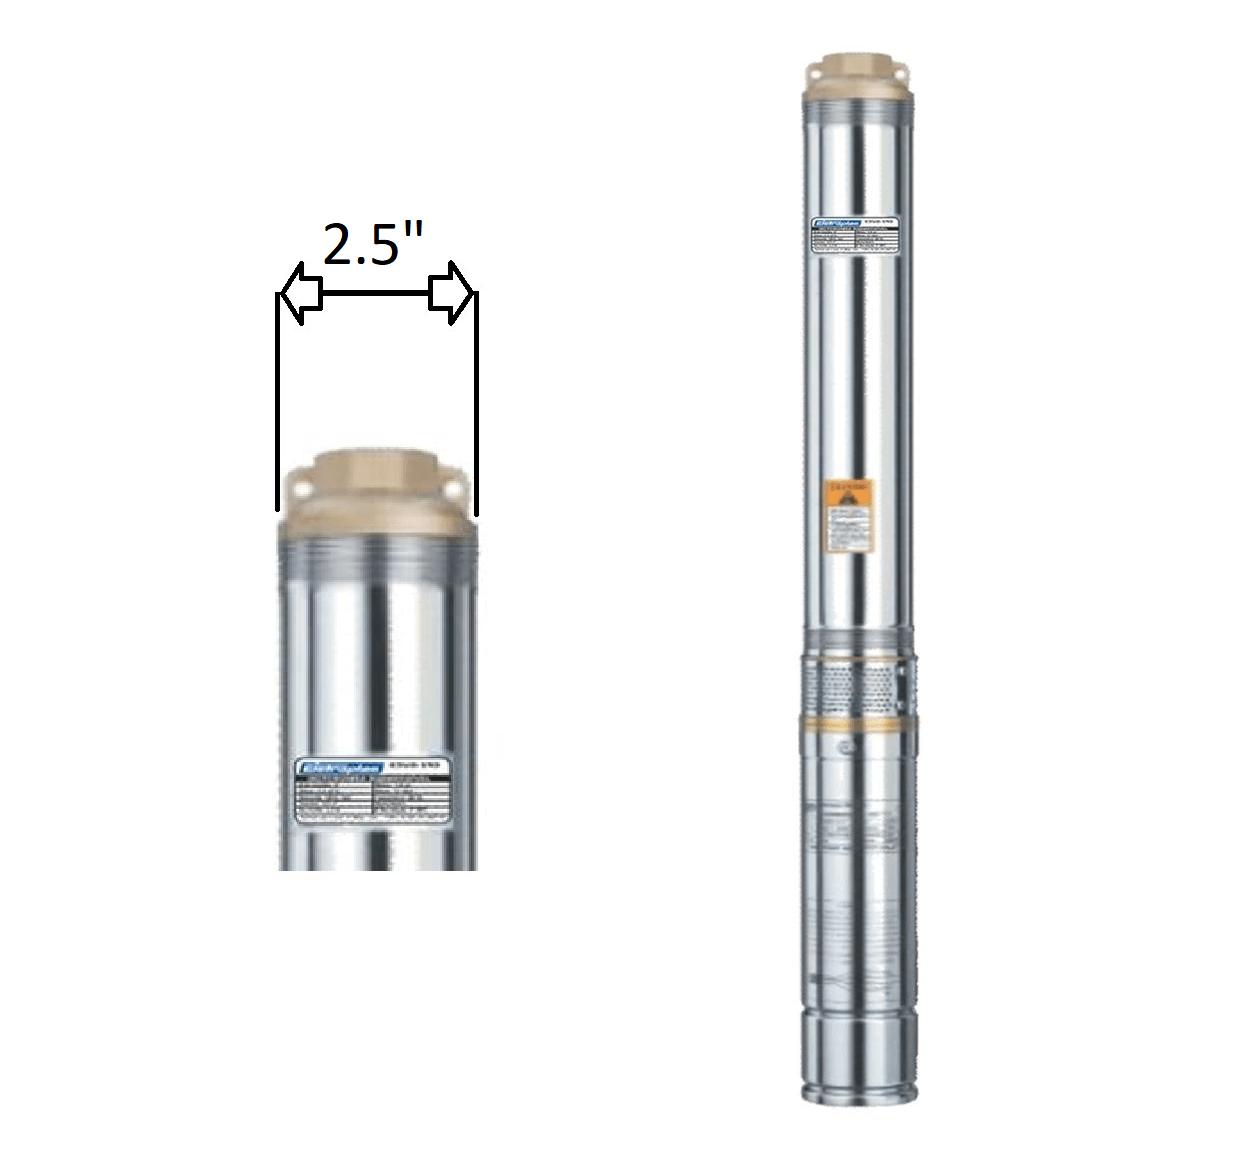 "Motobomba Submersa Caneta 1/3Cv 2,5"" ESUB-2.5/11 220V Eletroplas"